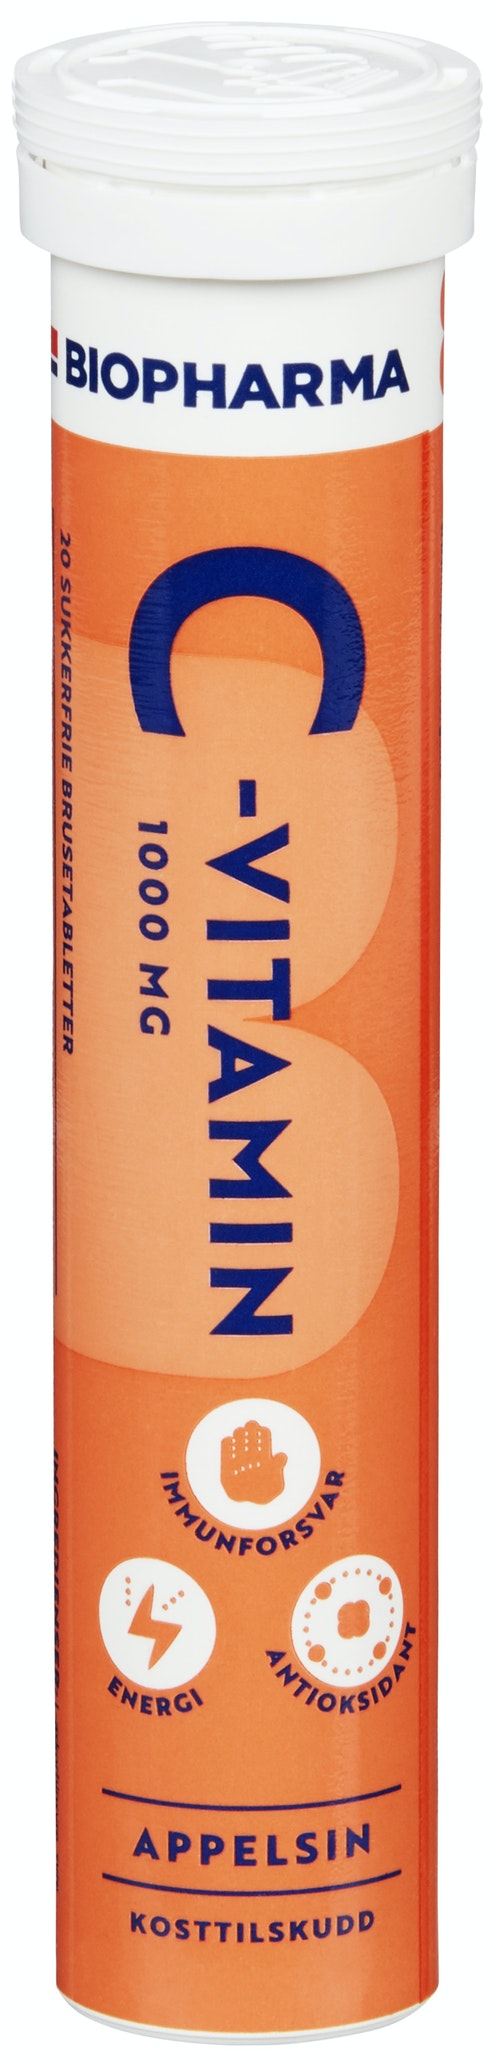 Biopharma C vitamin brusetab Appelsin 20 stk